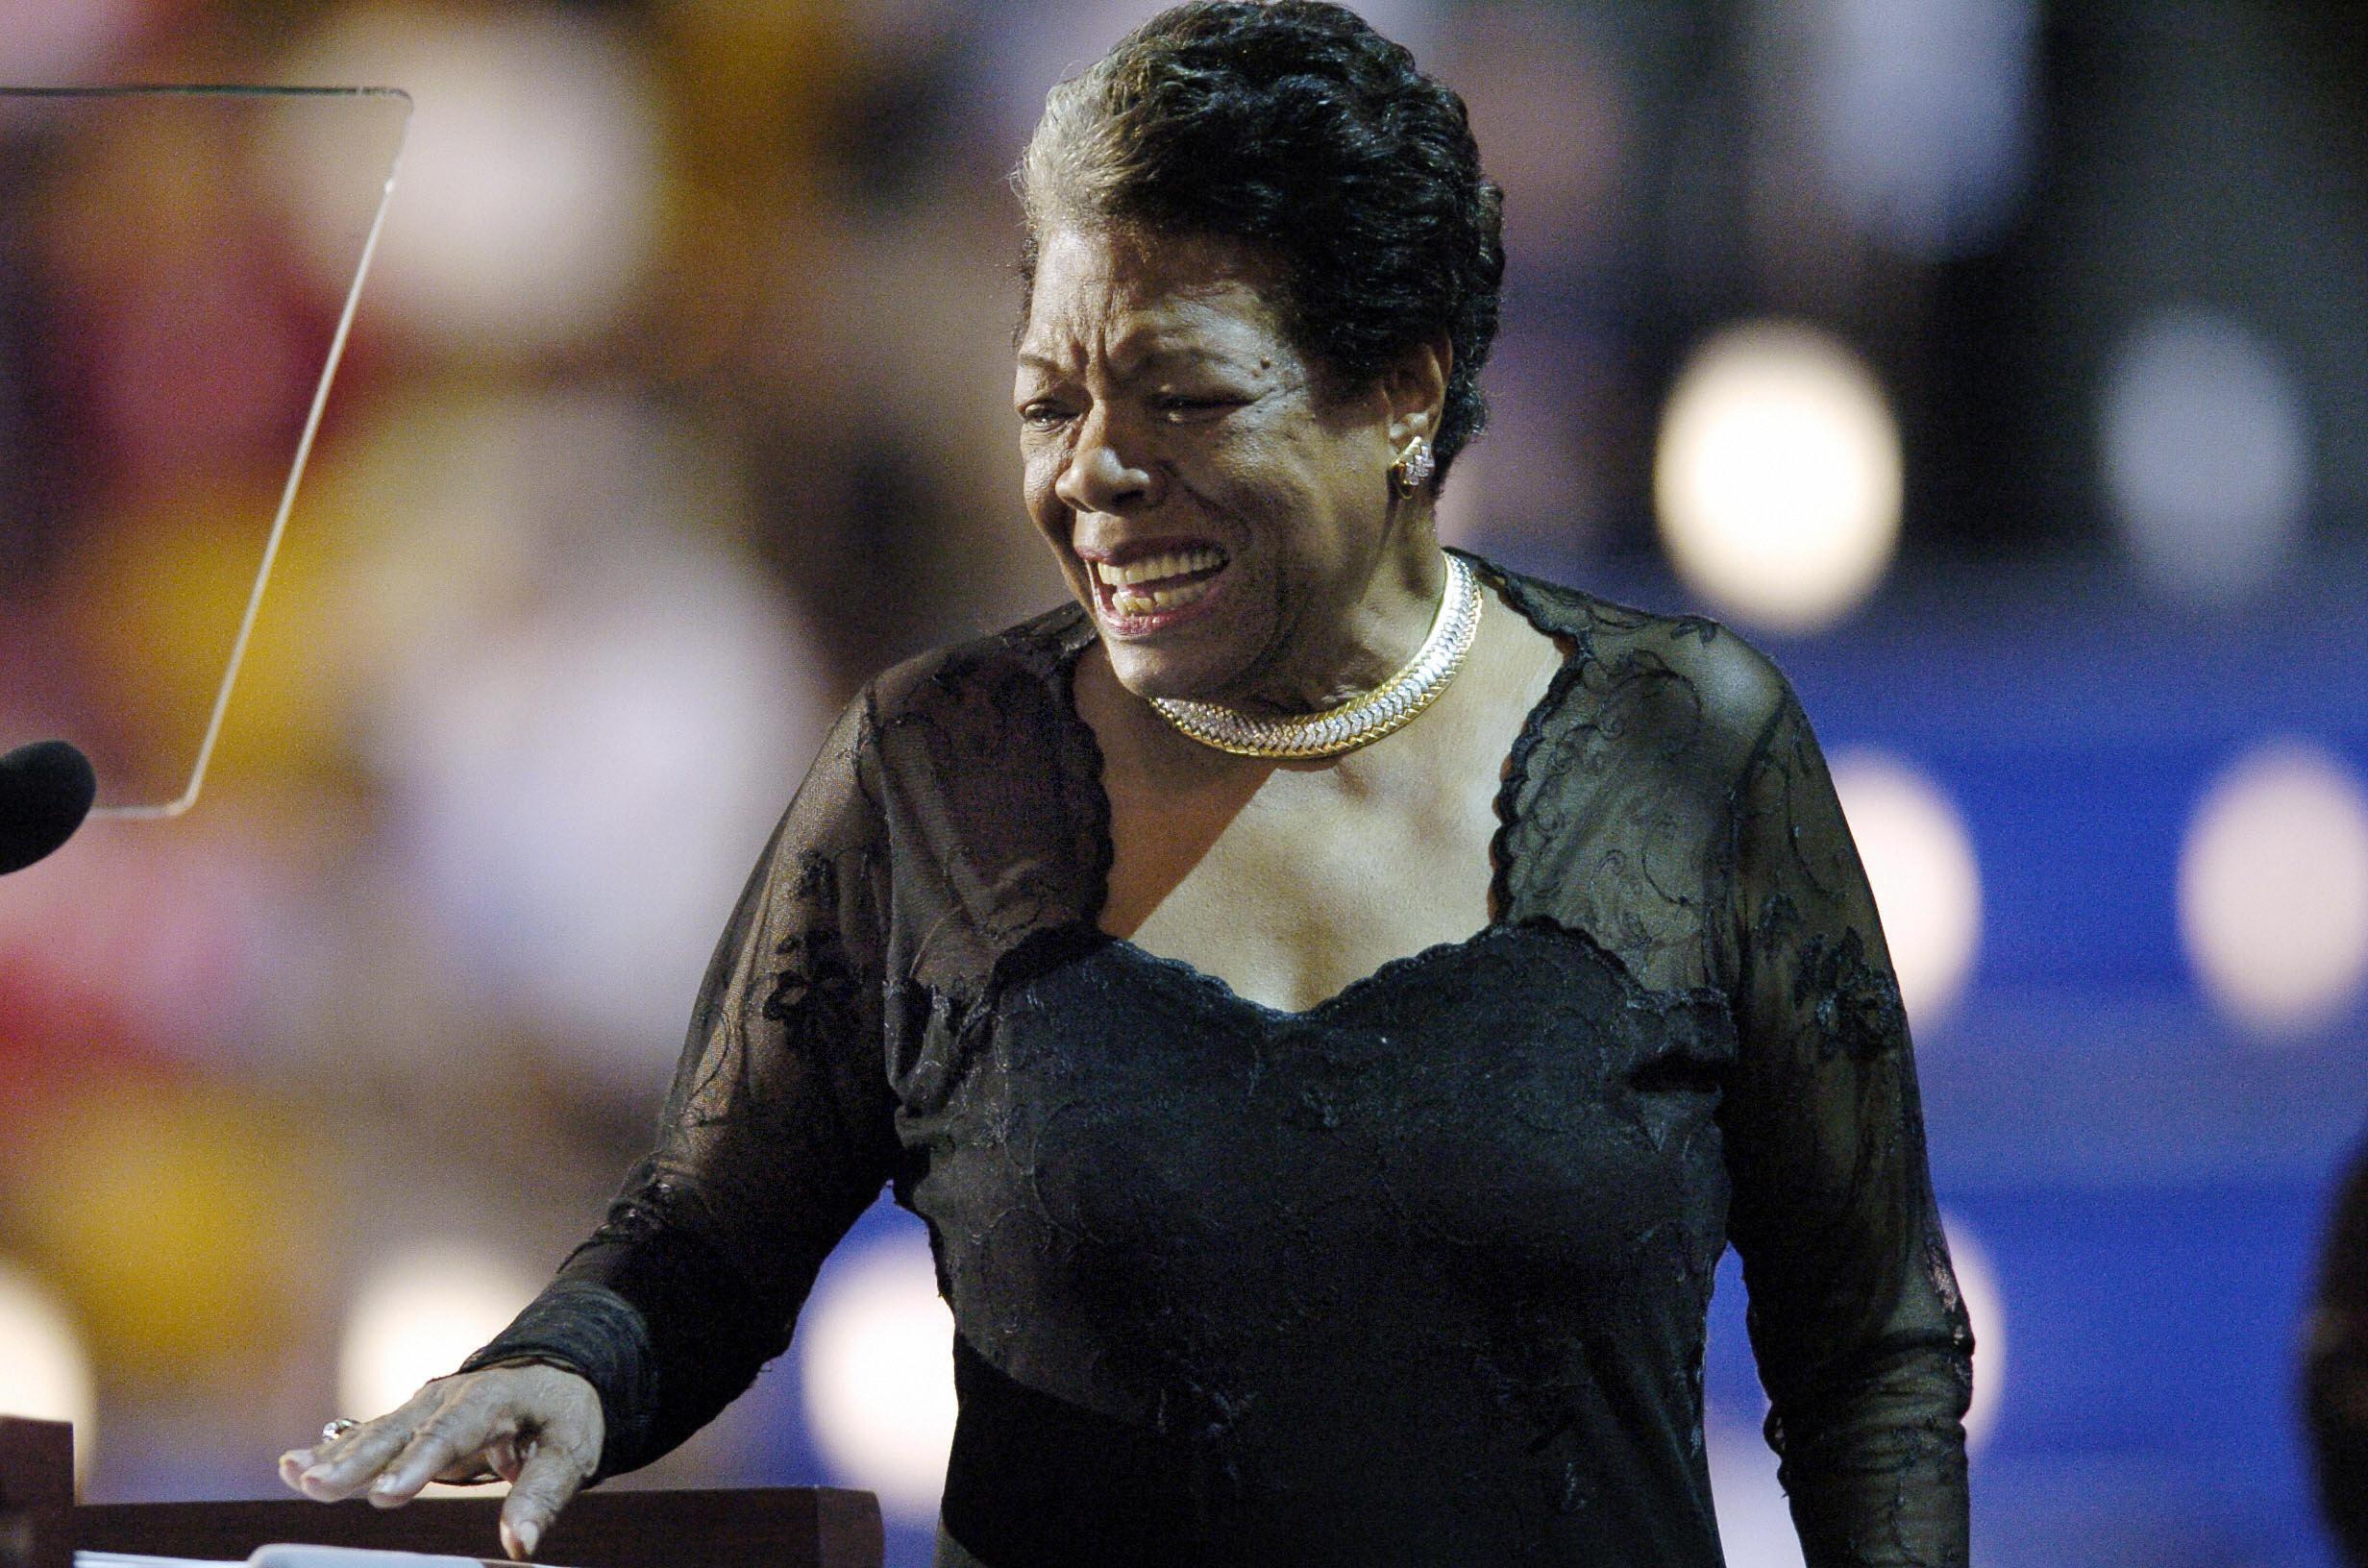 Poet and activist Maya Angelou addresses